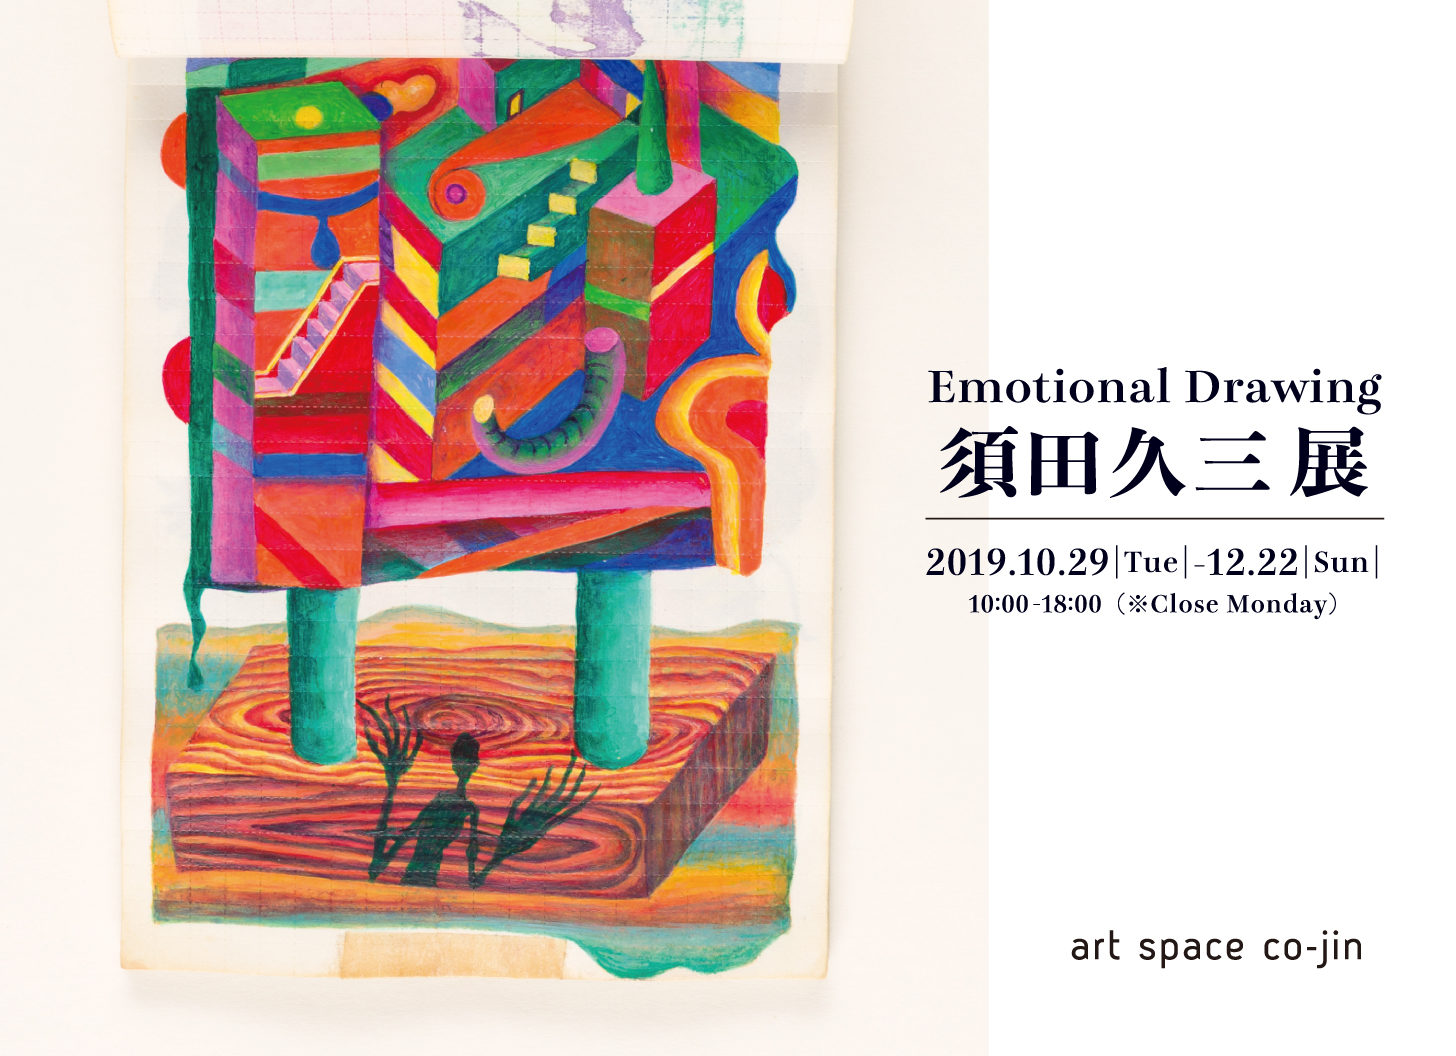 Emotional Drawing|SUDA Kyūzo